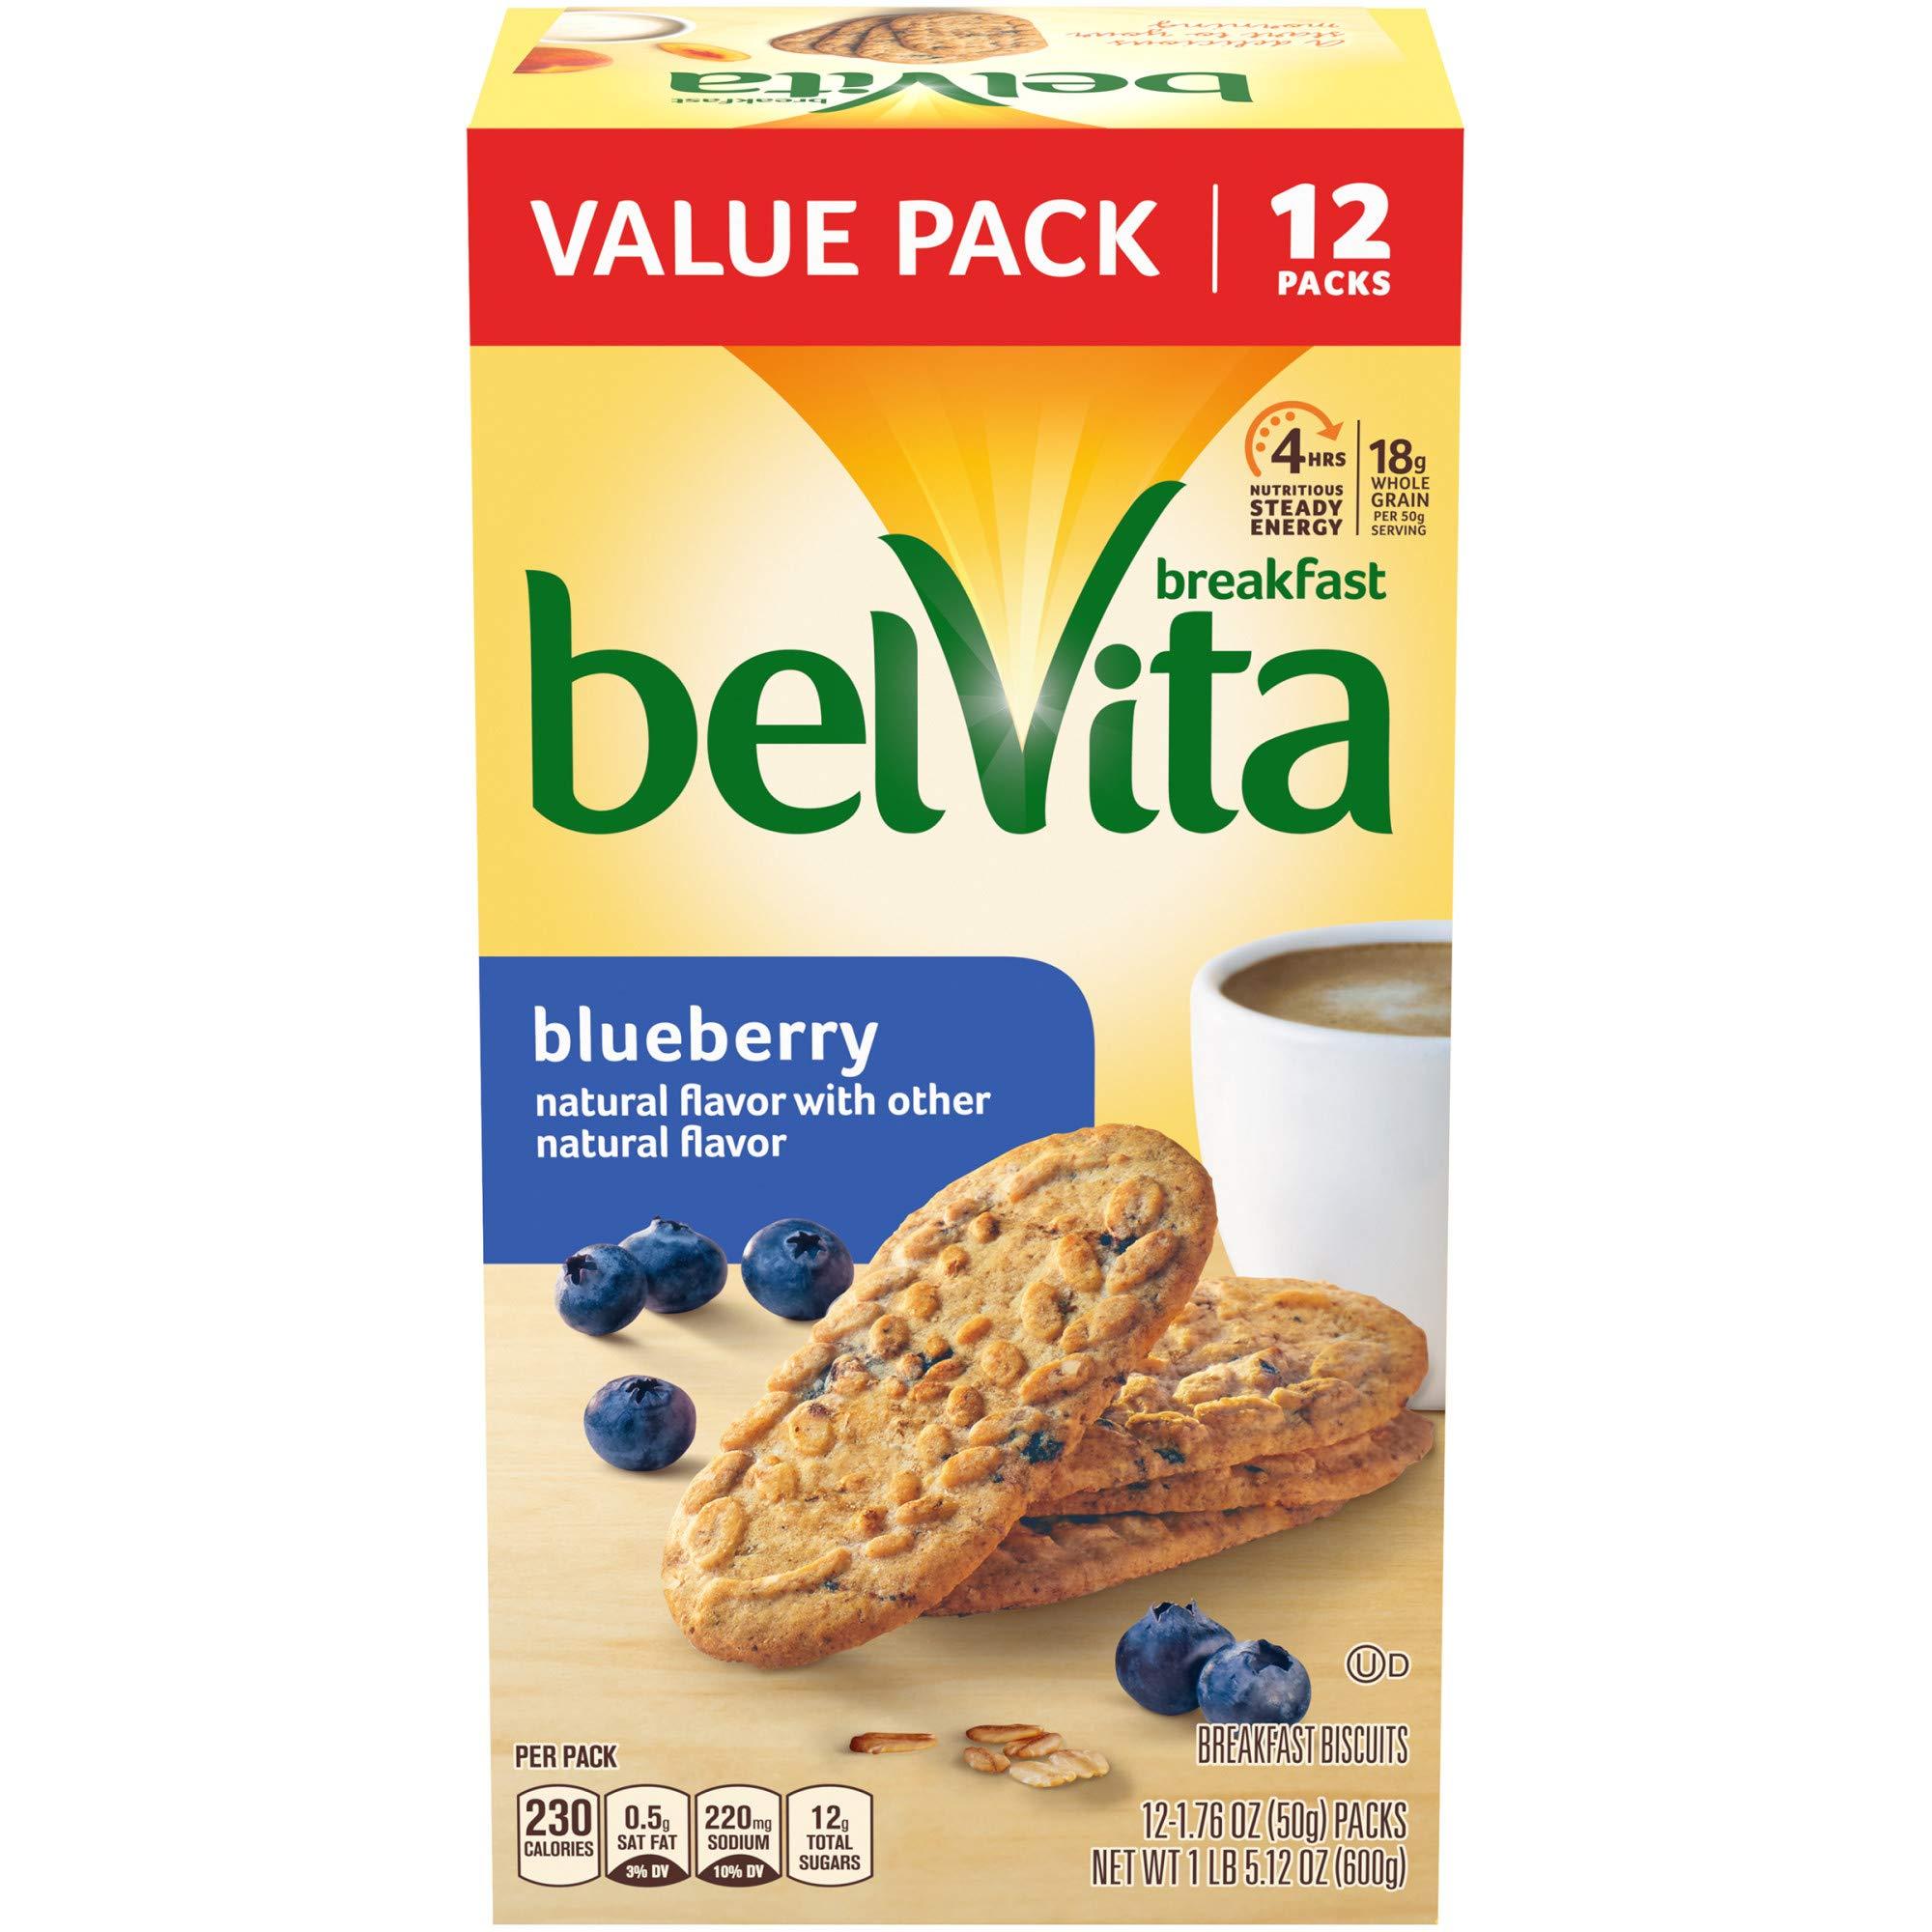 belVita Blueberry Breakfast Biscuits, 12 Packs (4 Biscuits Per Pack)